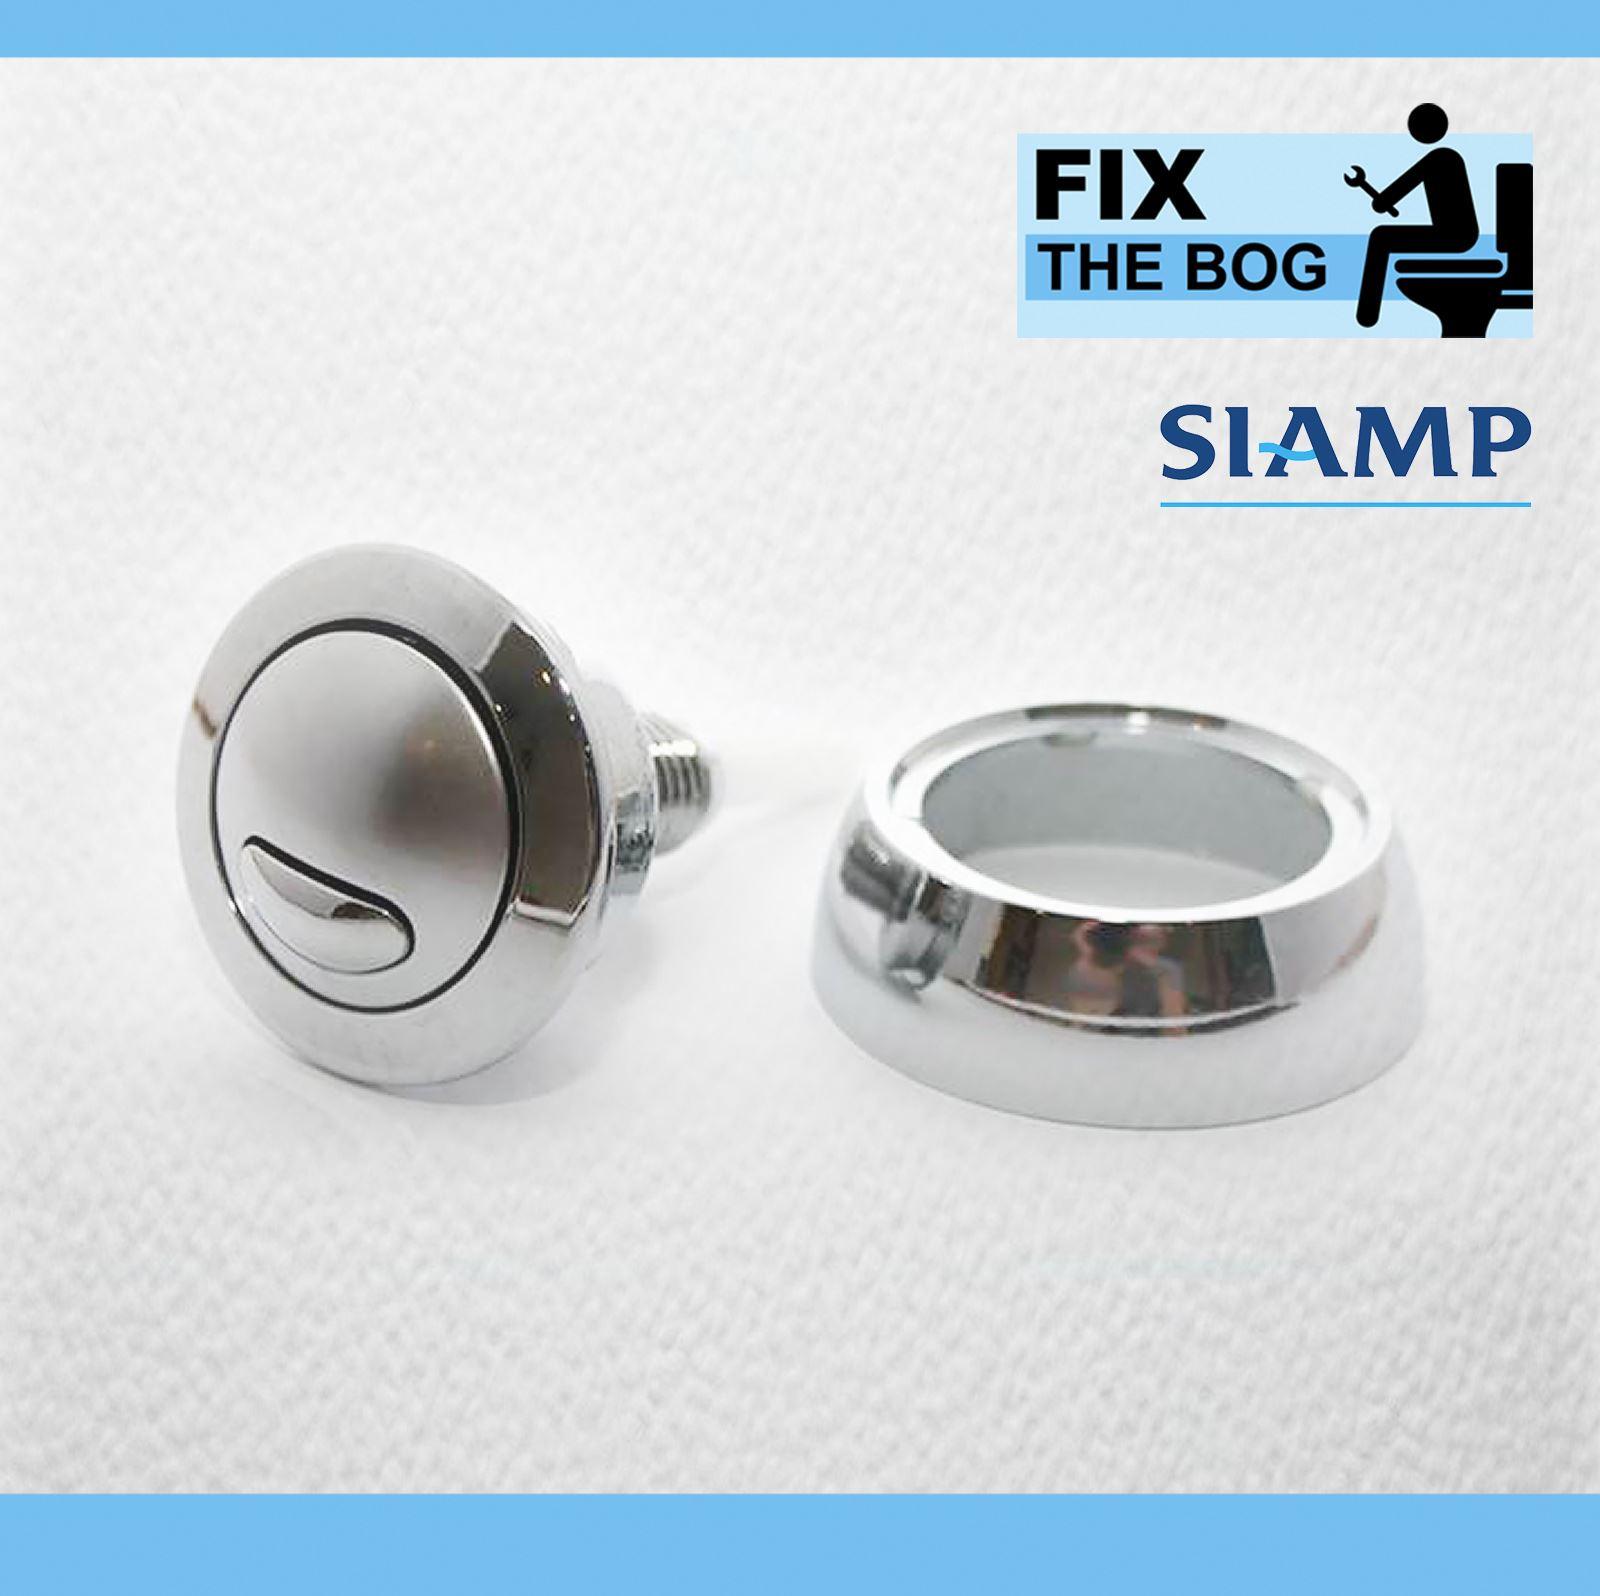 Siamp Optima 49 Toilet Push Button Dual Flush Water Saving